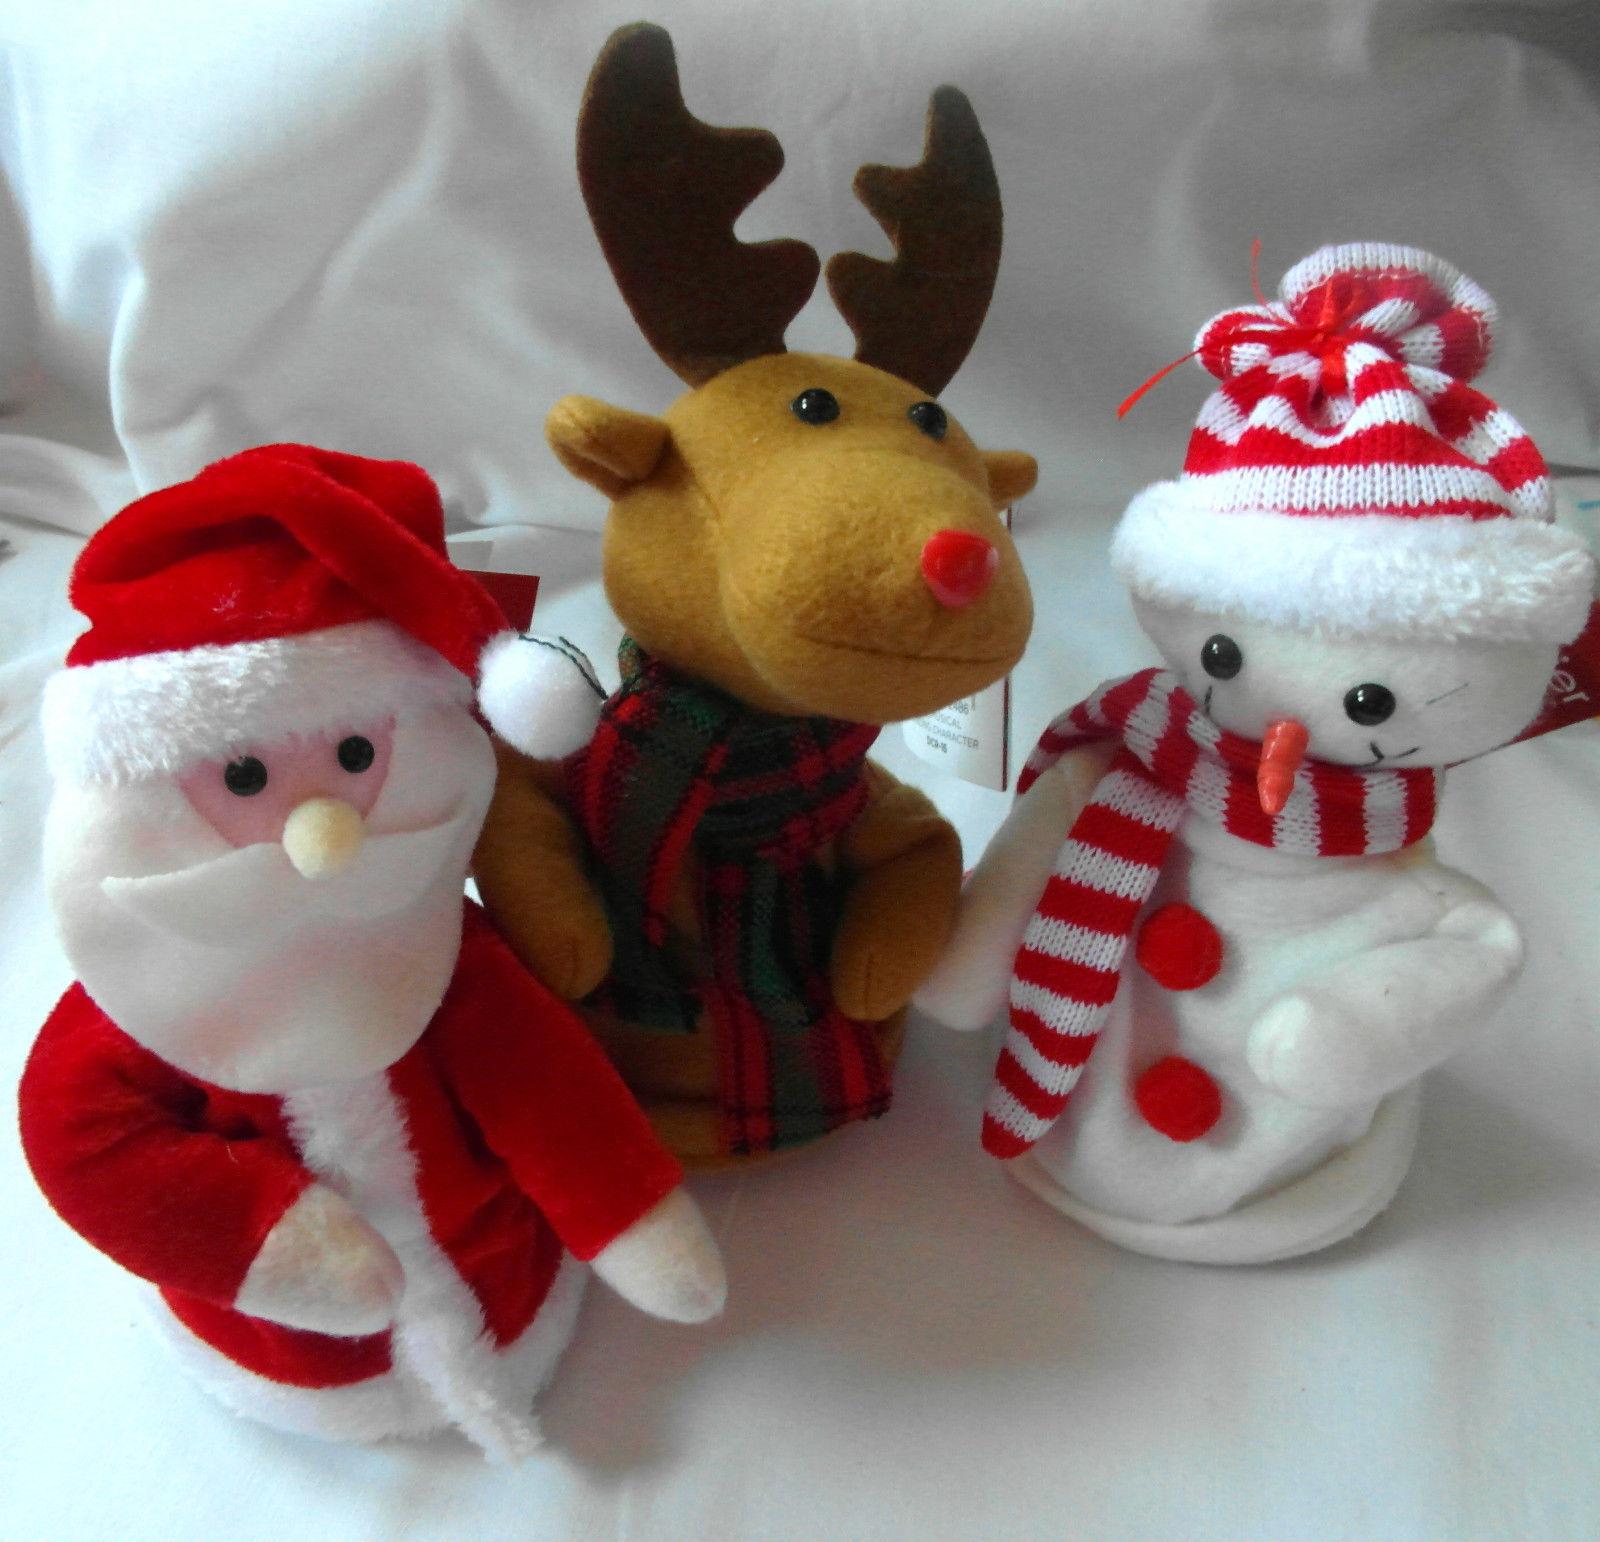 ec83881f72043 Singing Dancing 18cm Santa Claus Snowman Reindeer Christmas Decoration  Figure